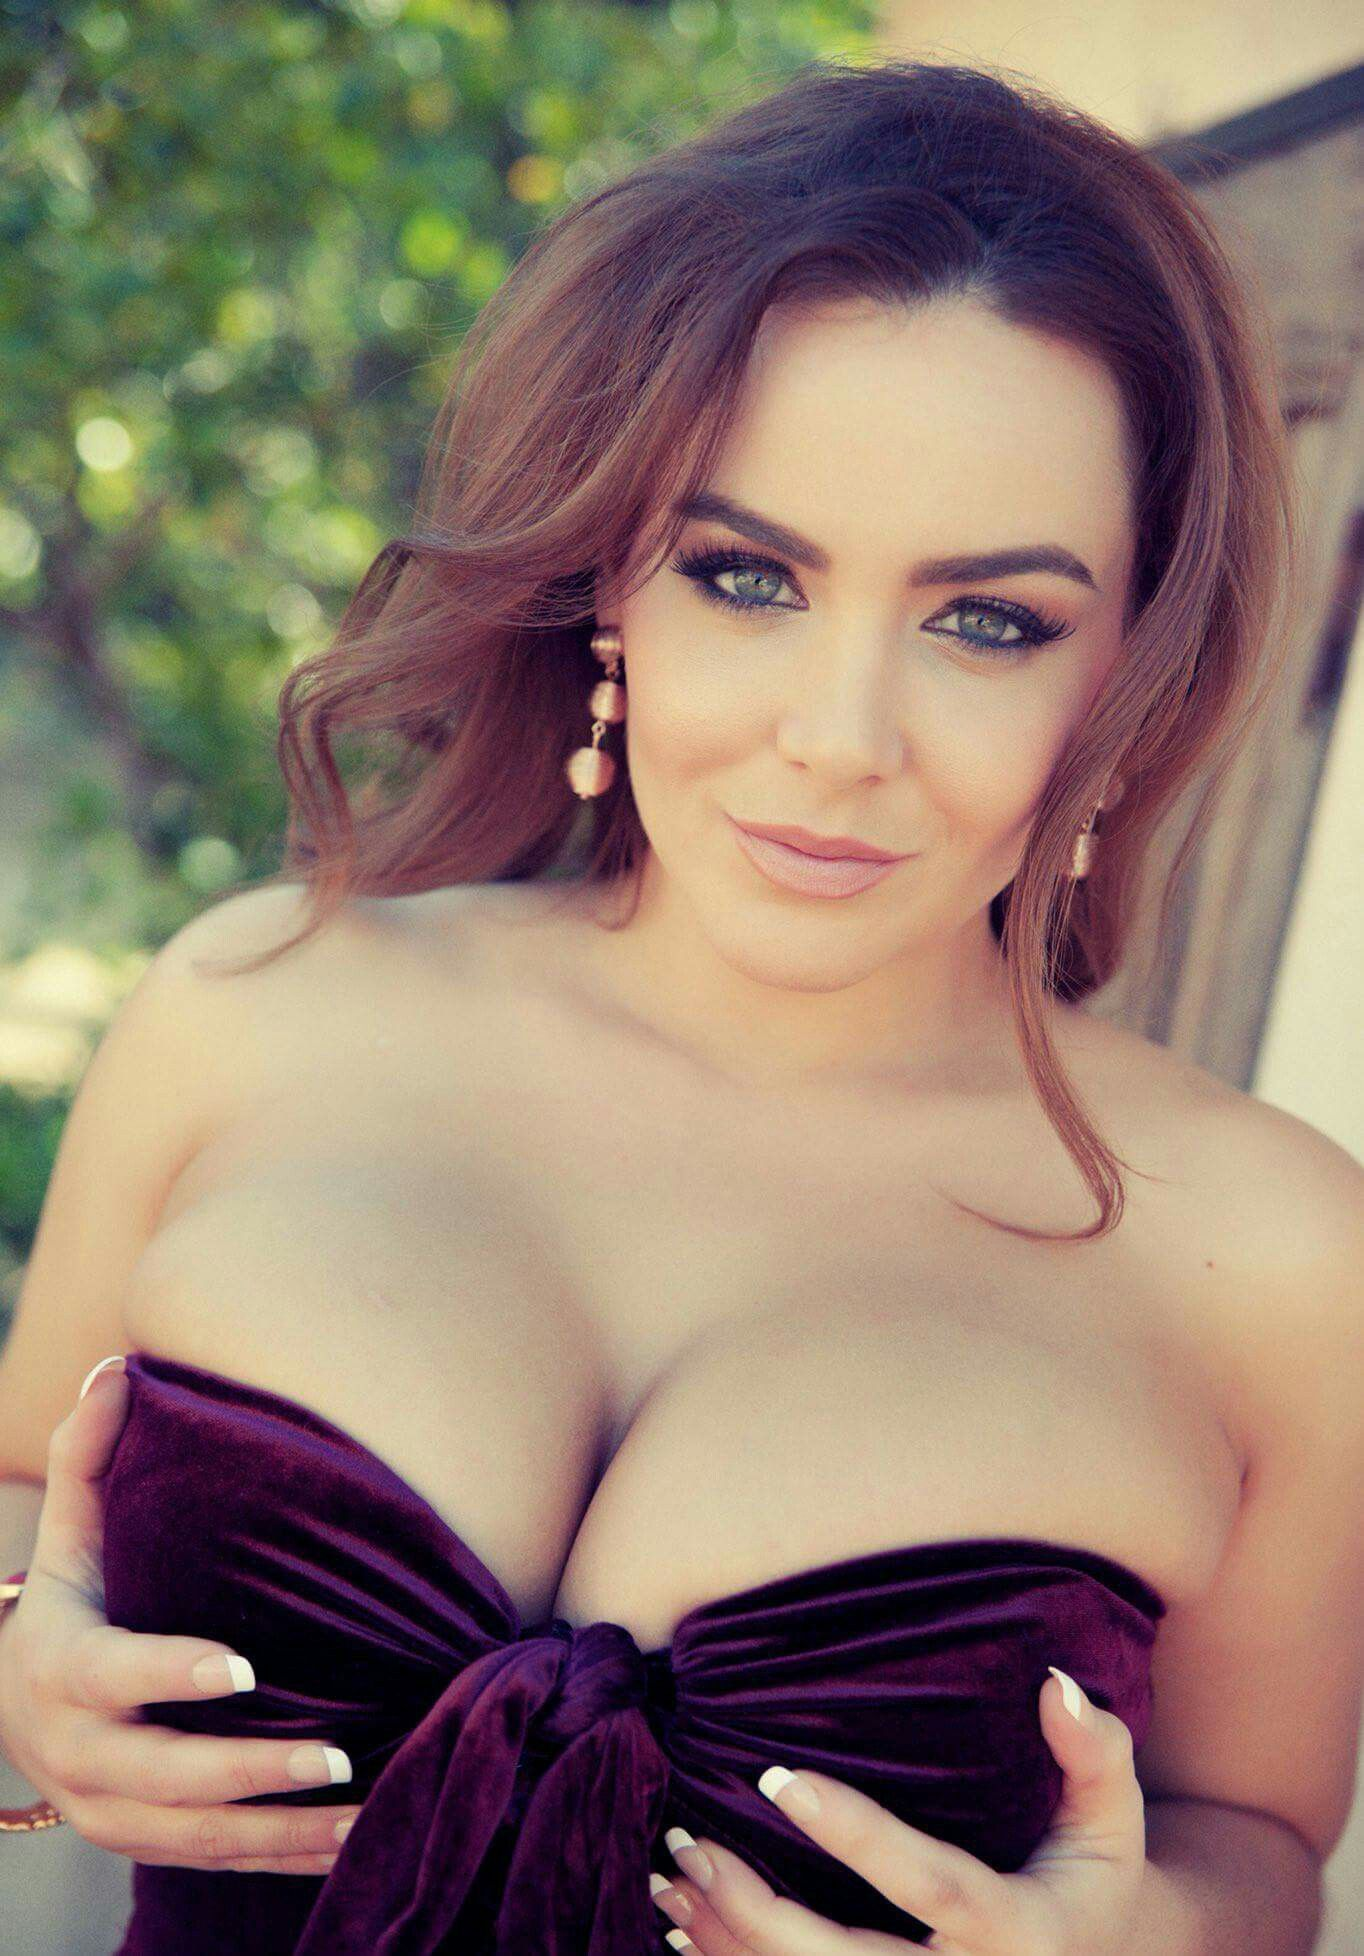 Hottest boobs in world